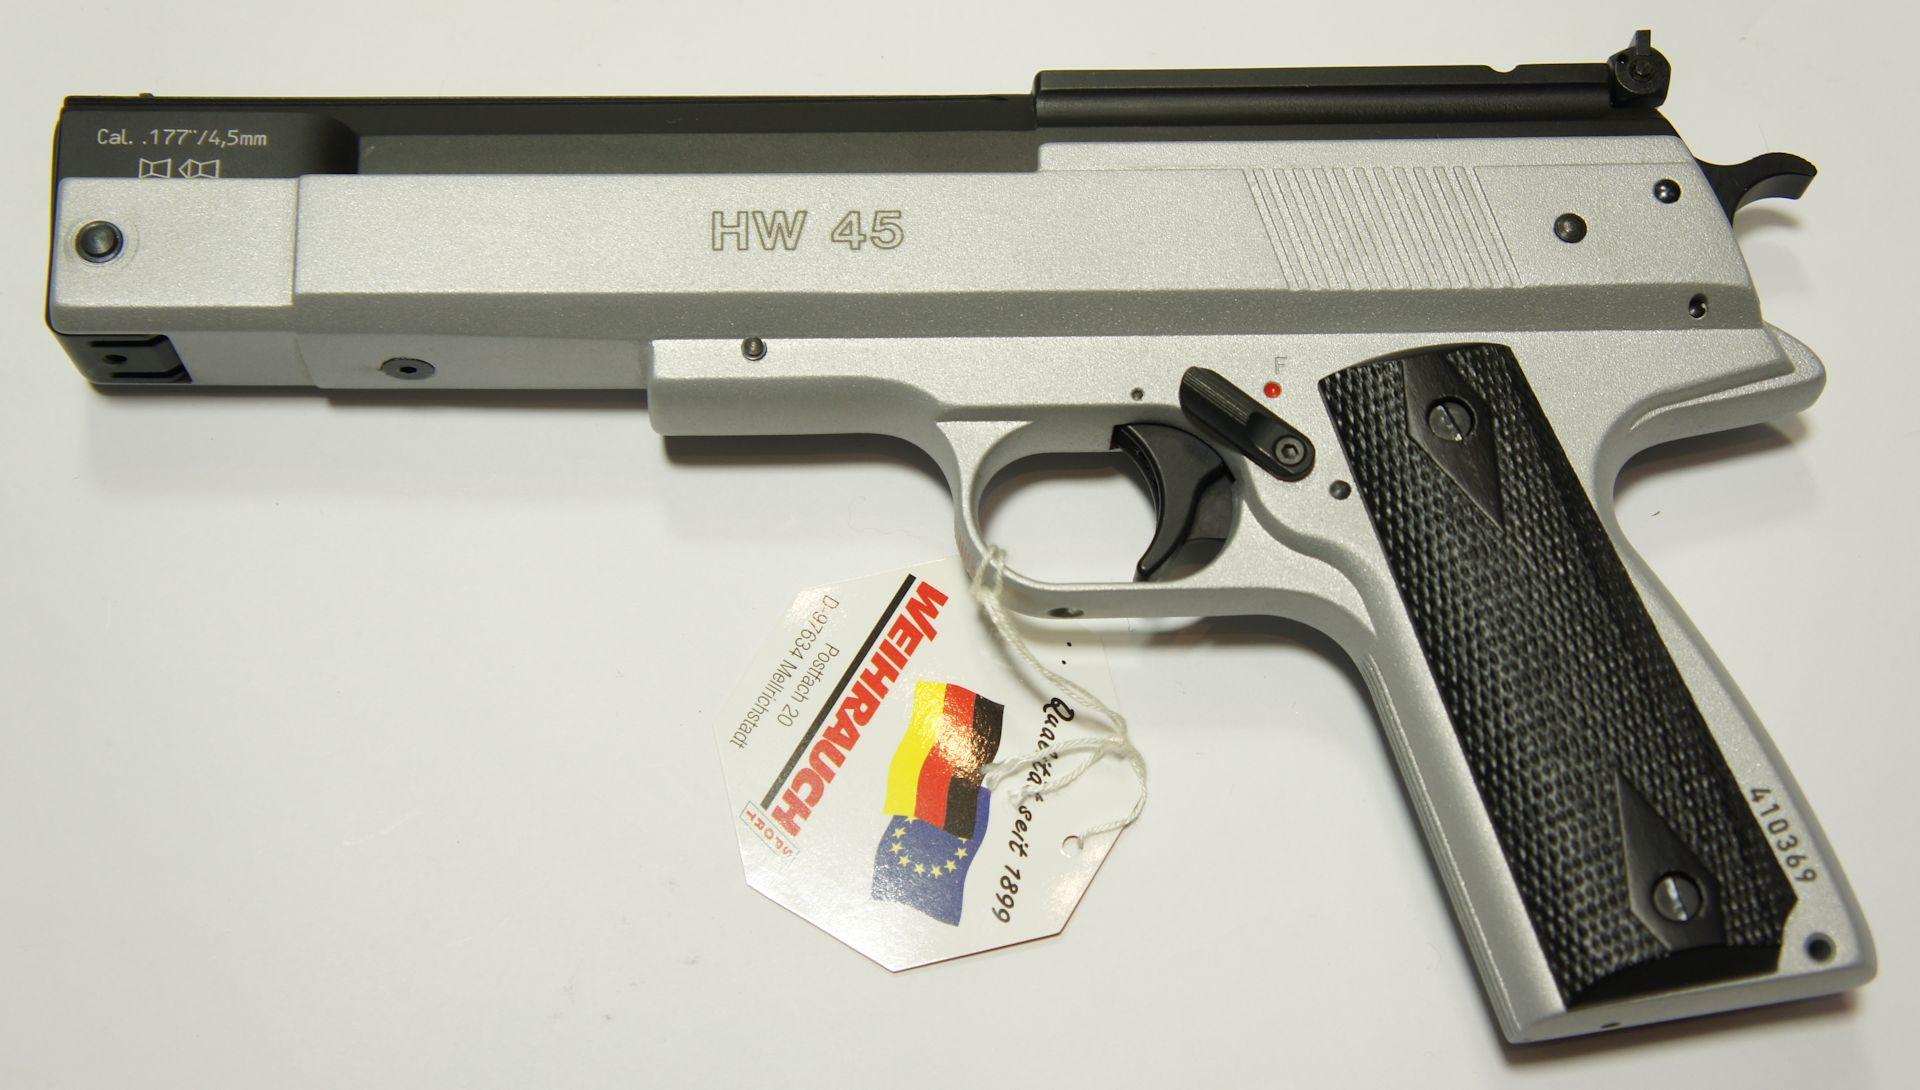 Luftpistole HW 45 Kaliber 4,5mm, Silberfinish